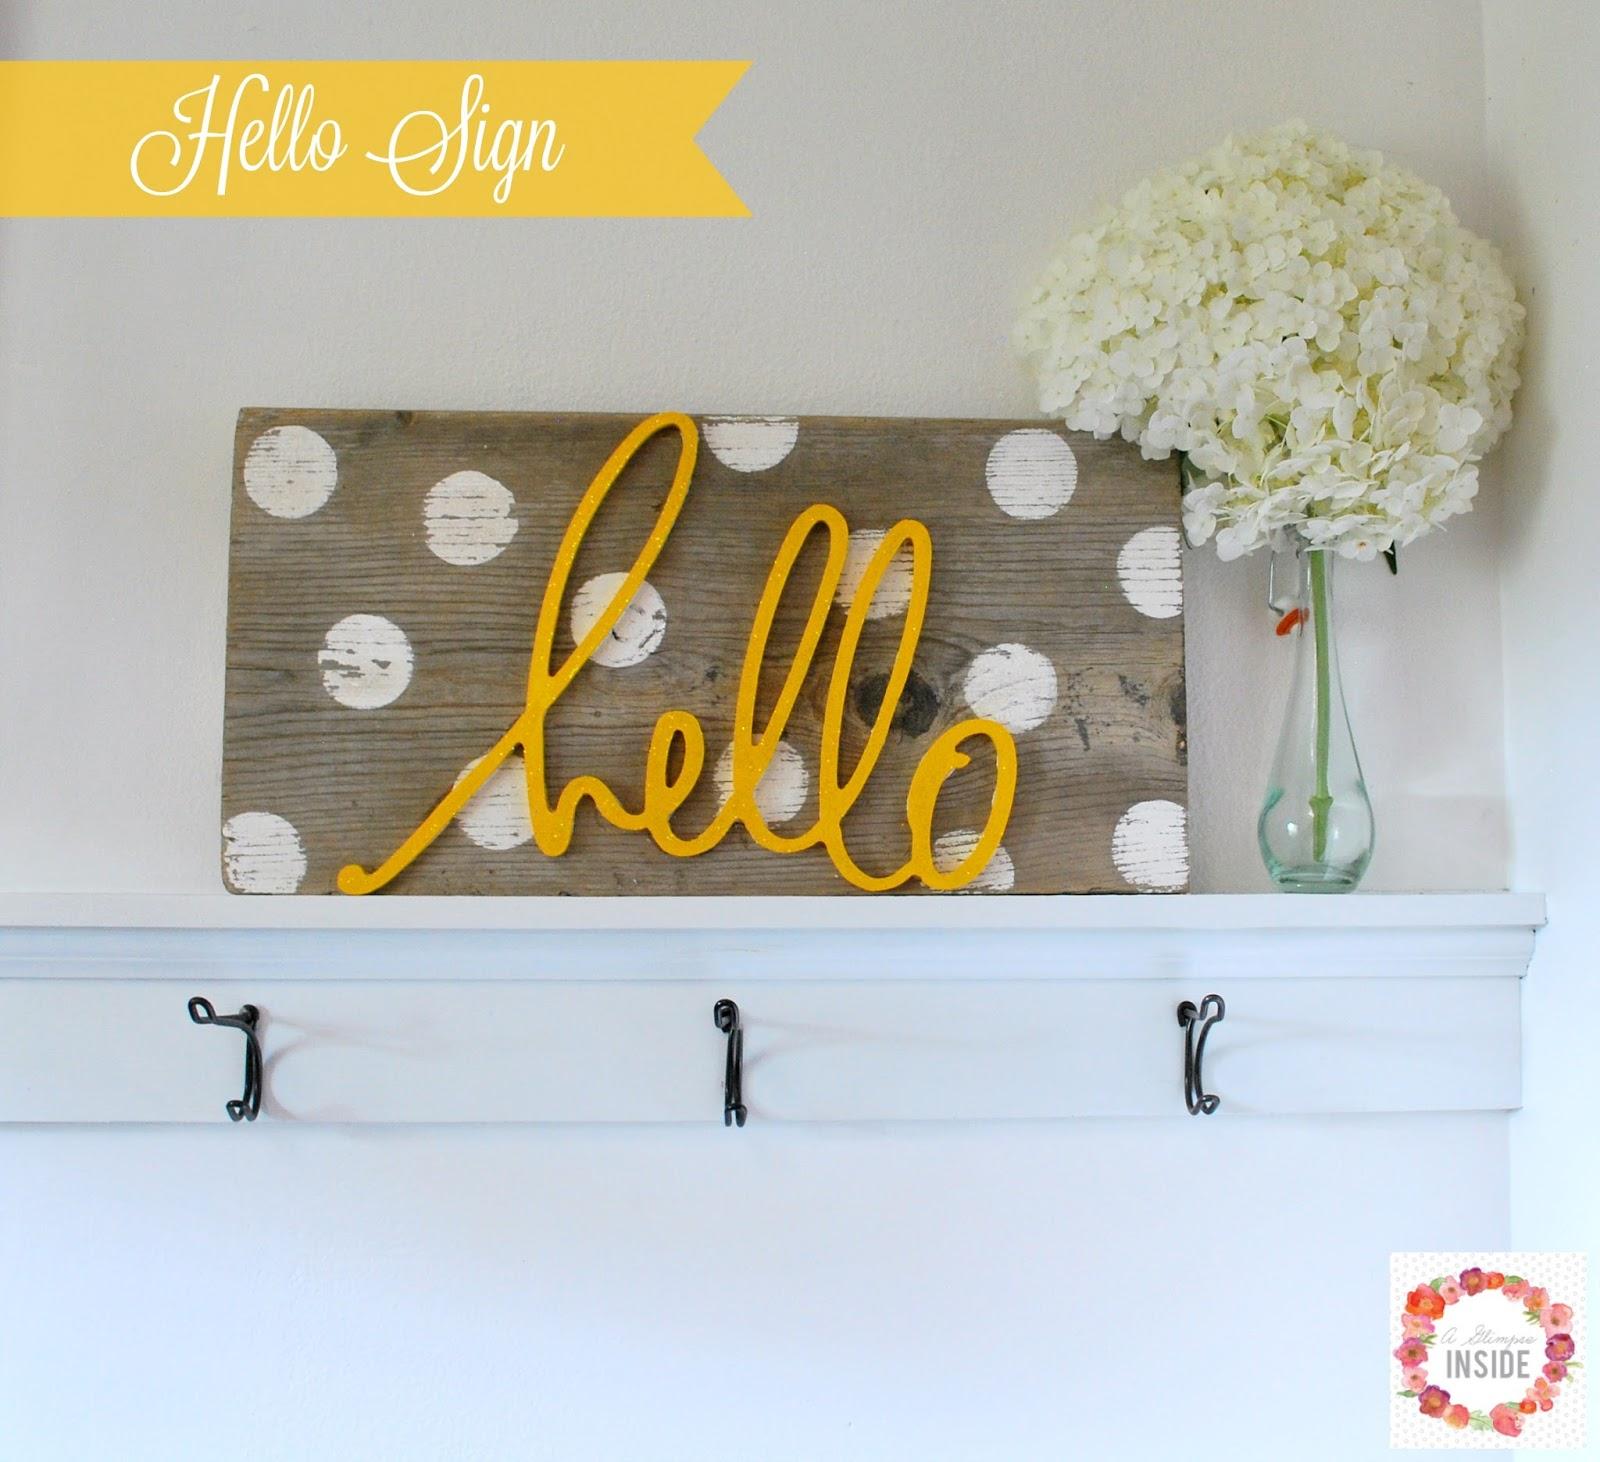 http://www.aglimpseinsideblog.com/2016/07/polka-dot-hello-sign.html